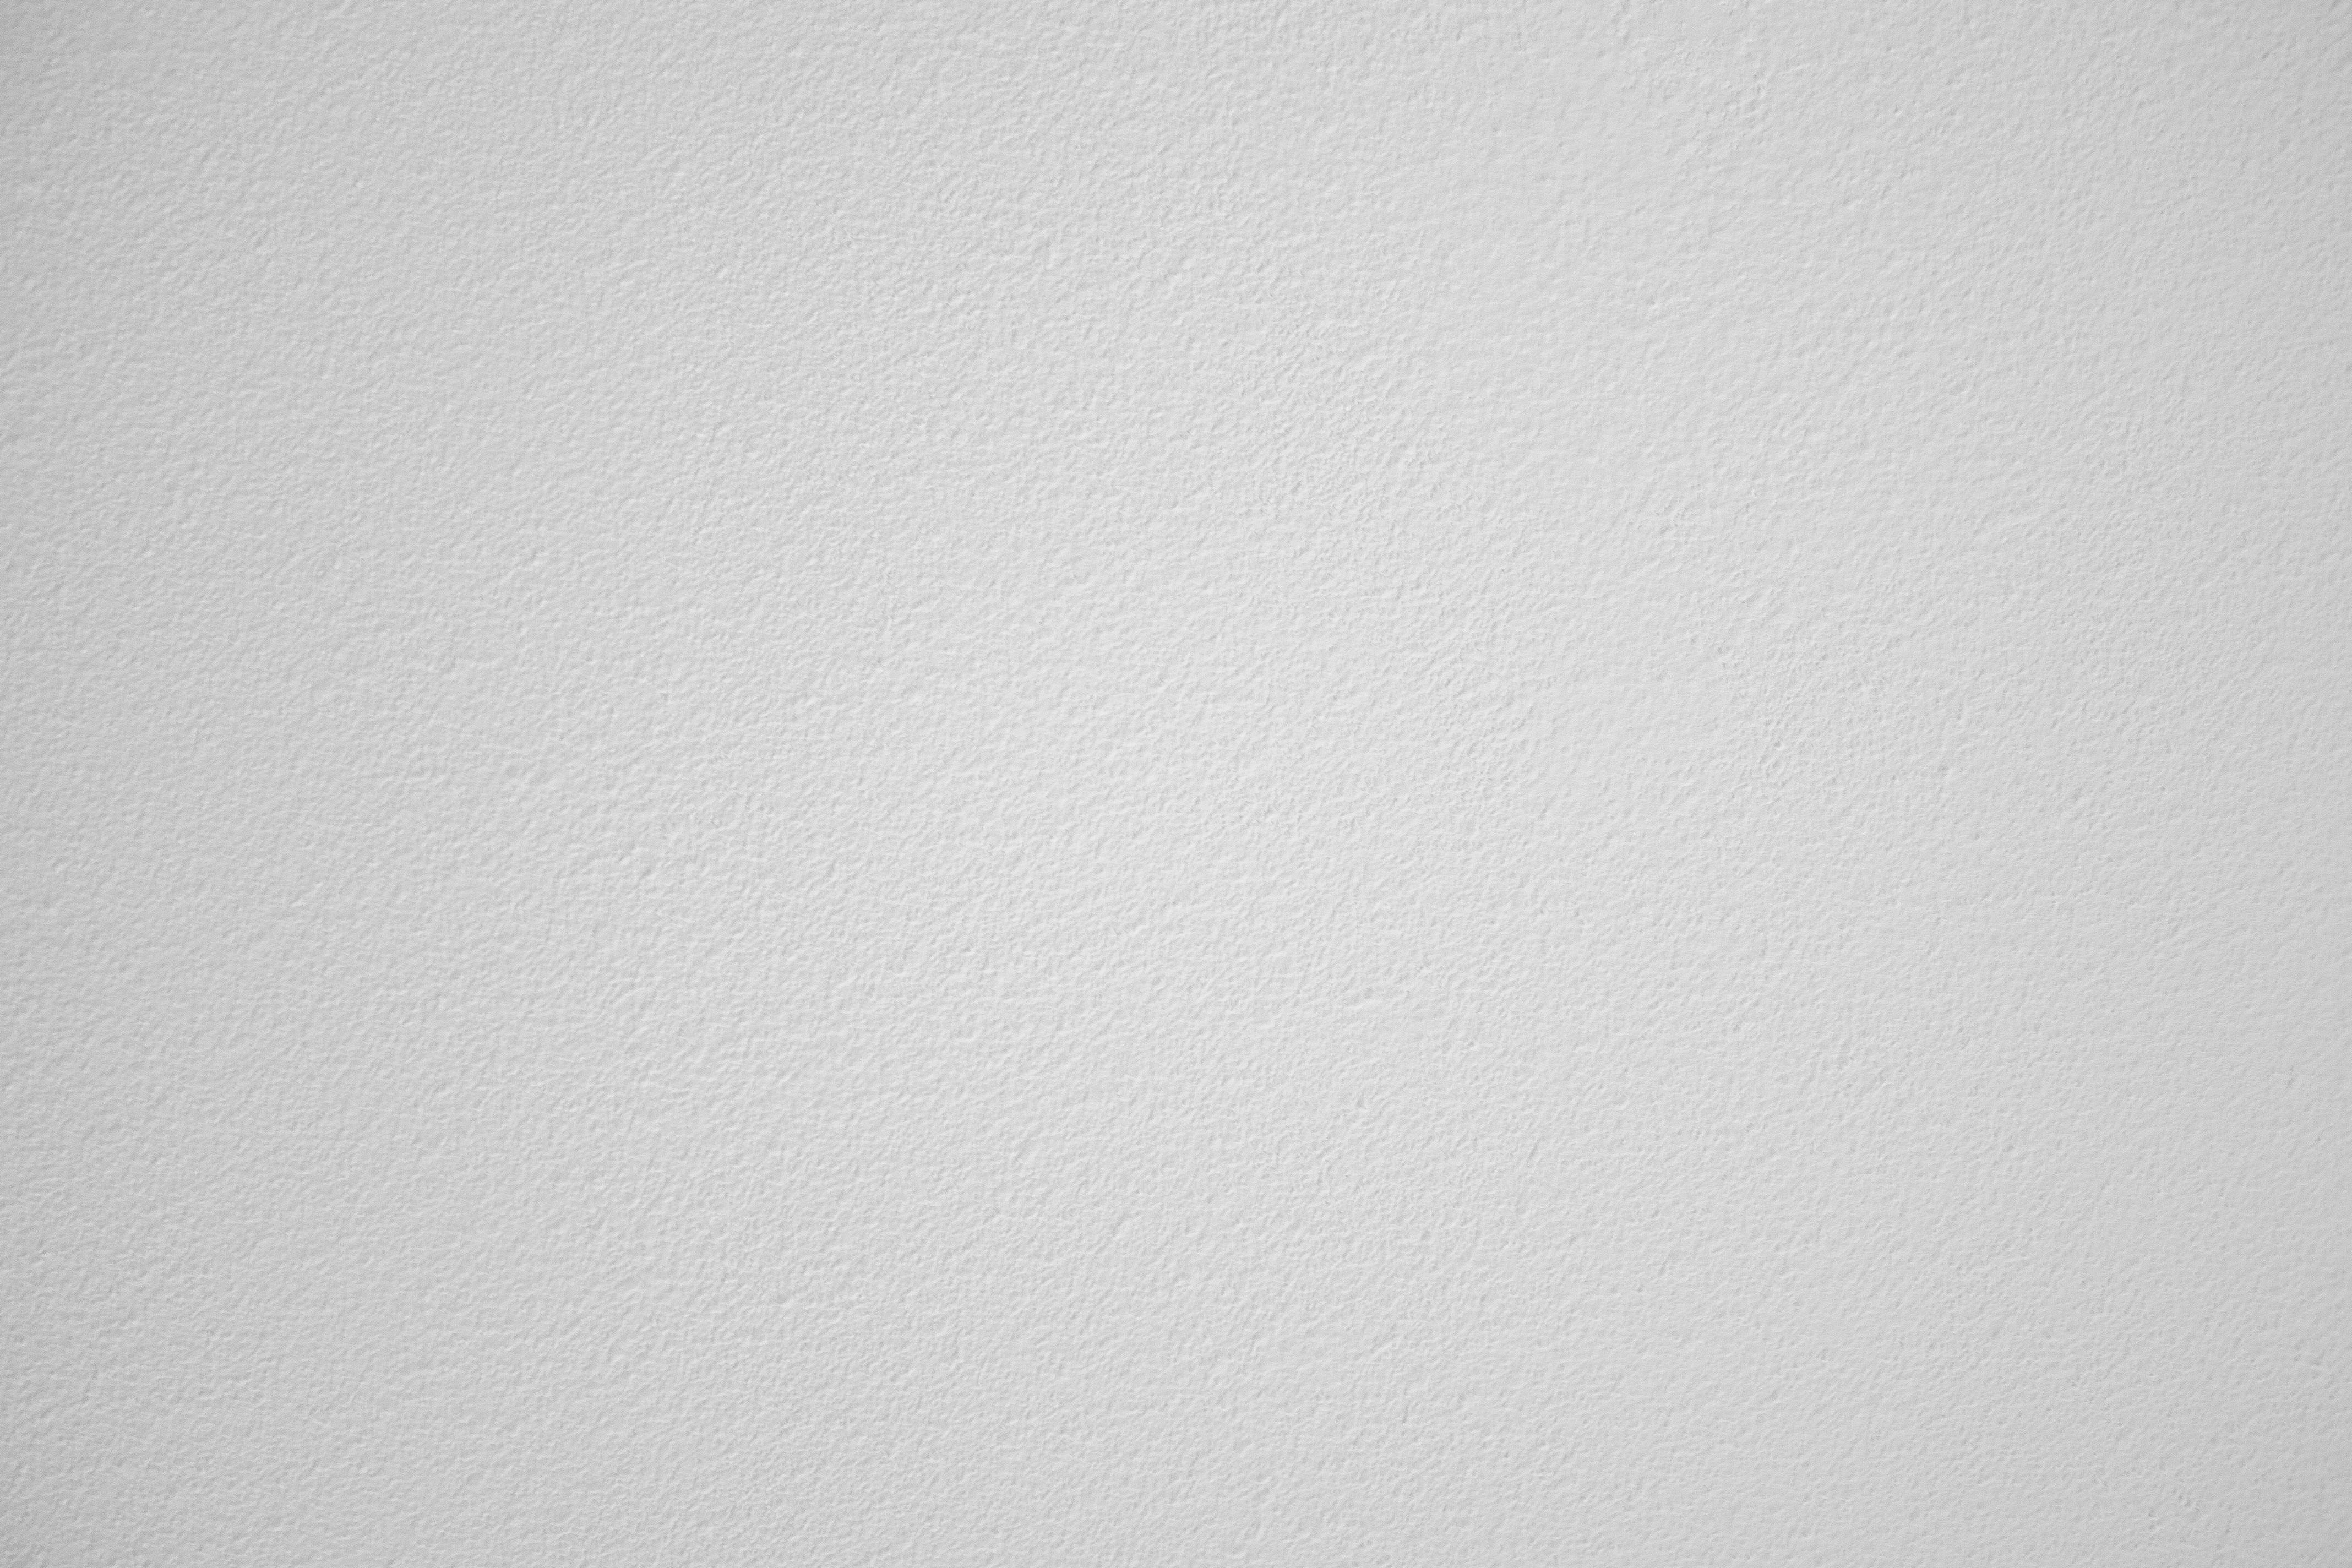 Fotos Gratis Ligero Estructura Madera Blanco Textura